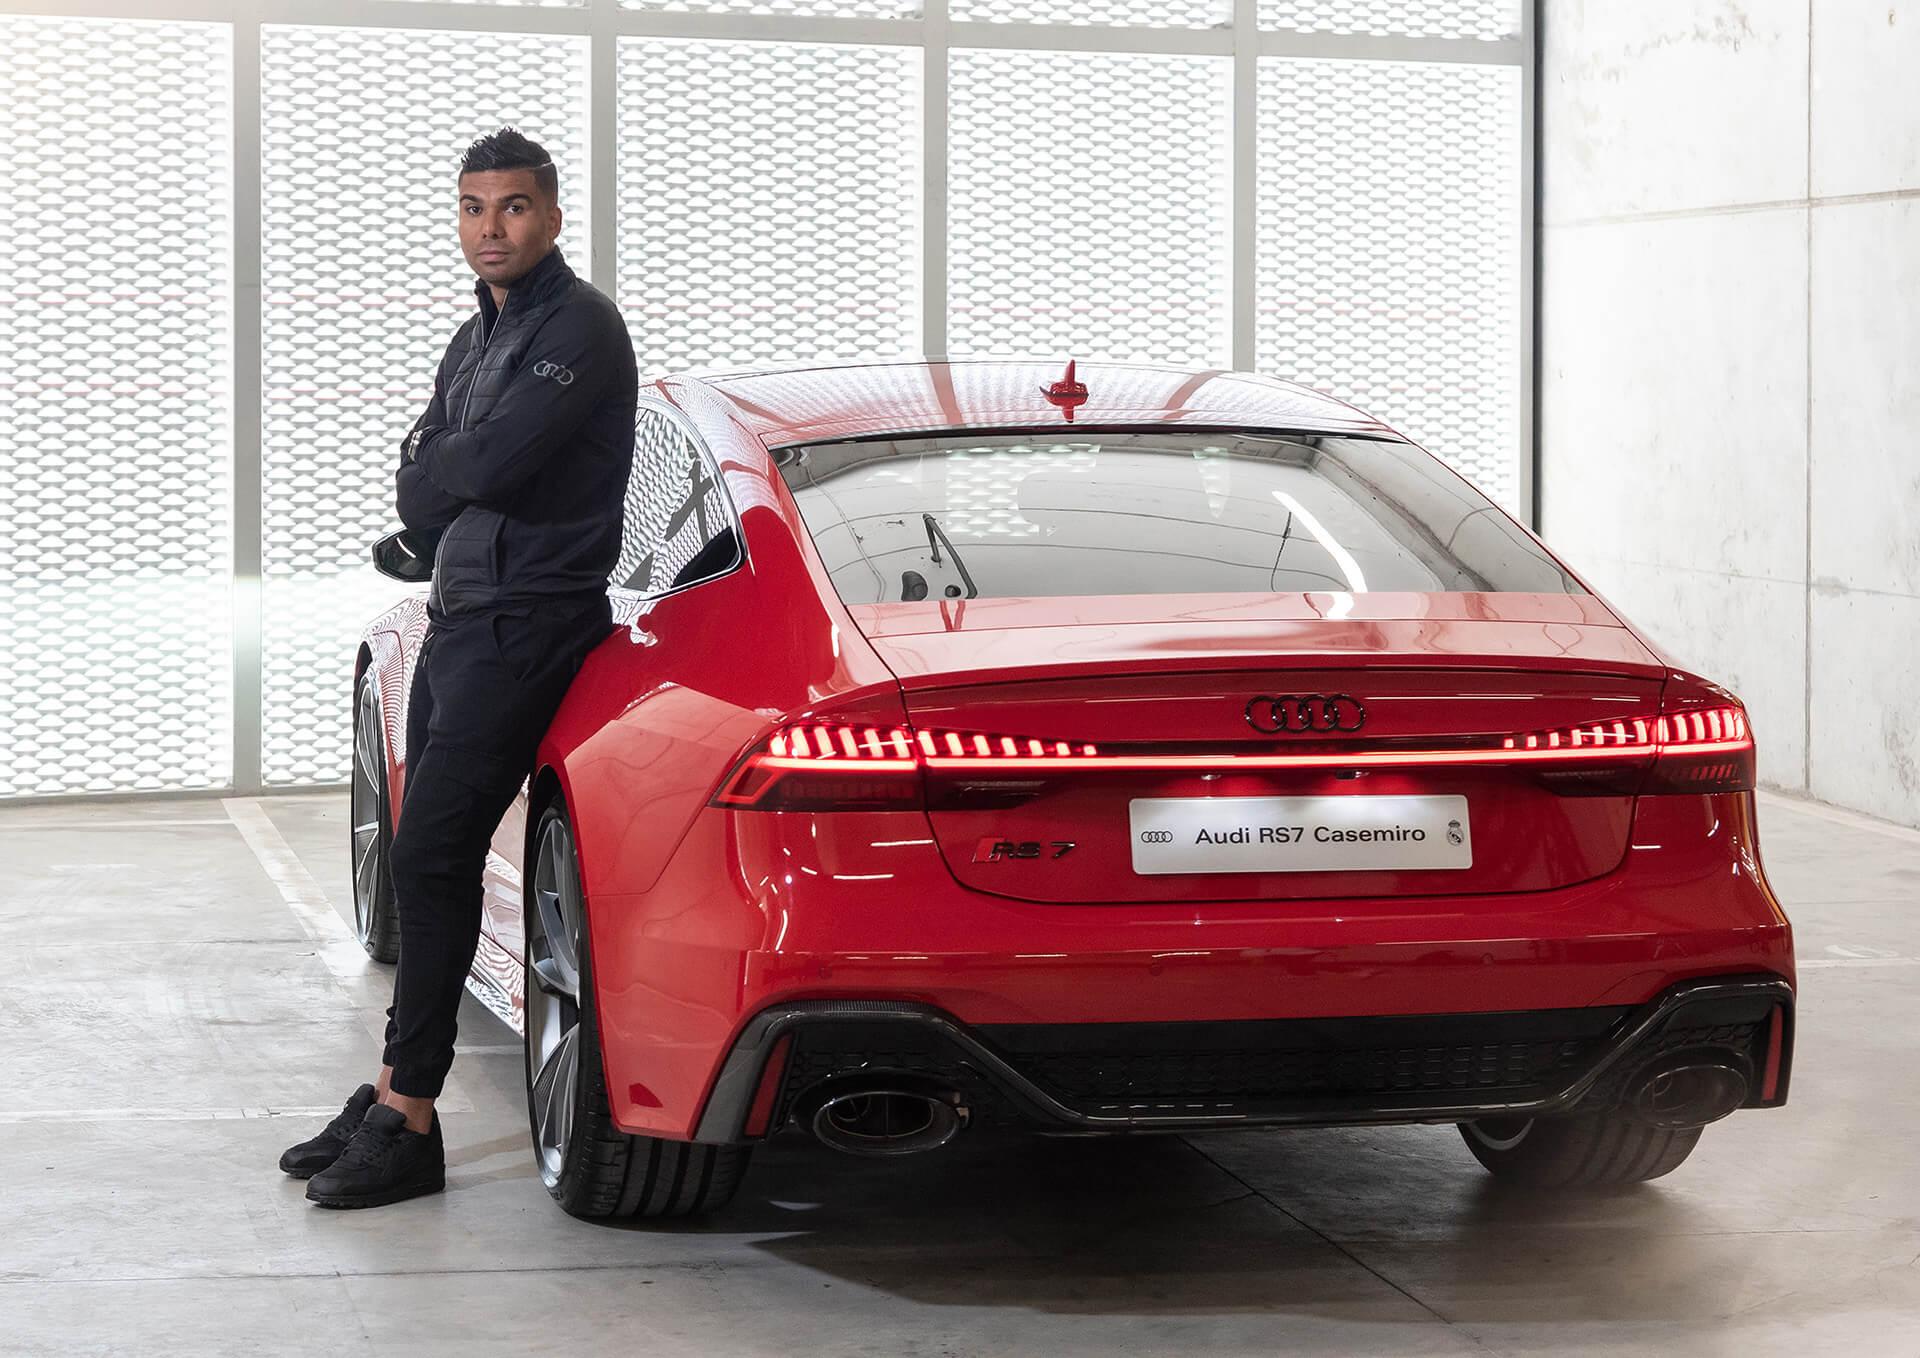 AUDI & REAL MADRID - Carlos Casemiro - Audi RS 7 Sportback 4.0 TFSI quattro